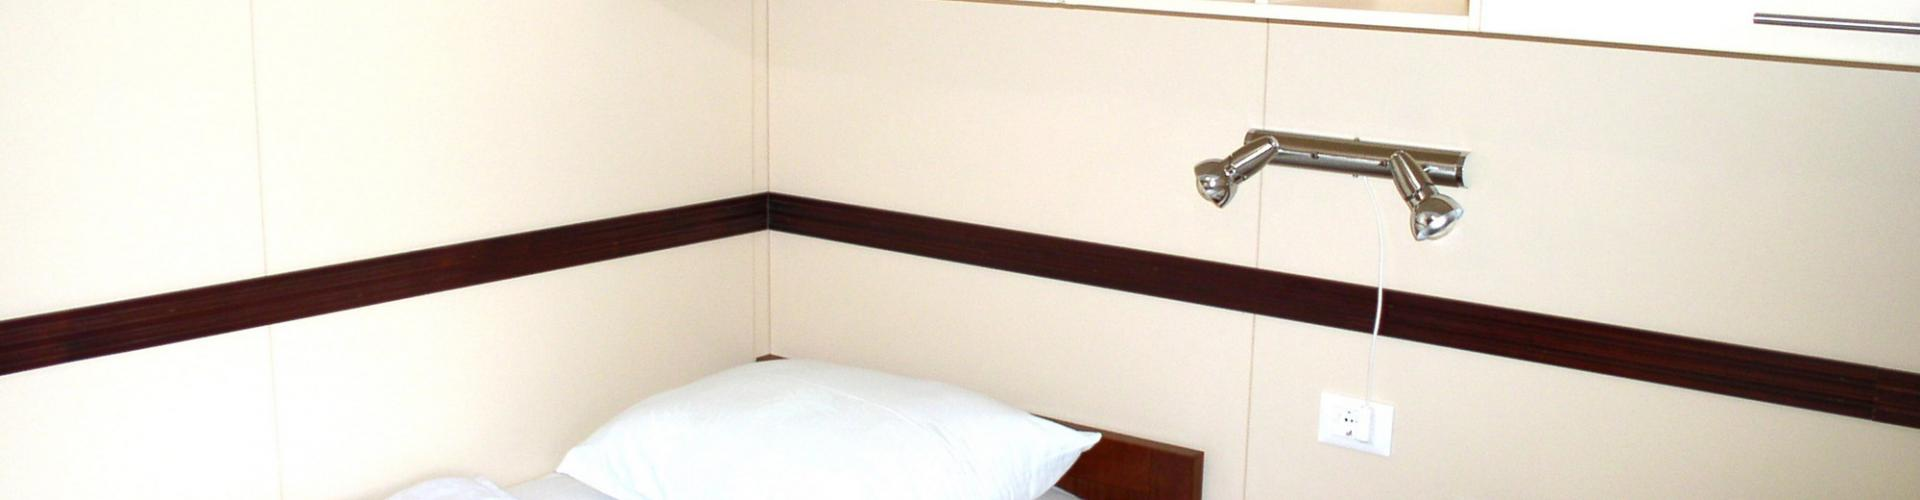 Cabin (upper deck)